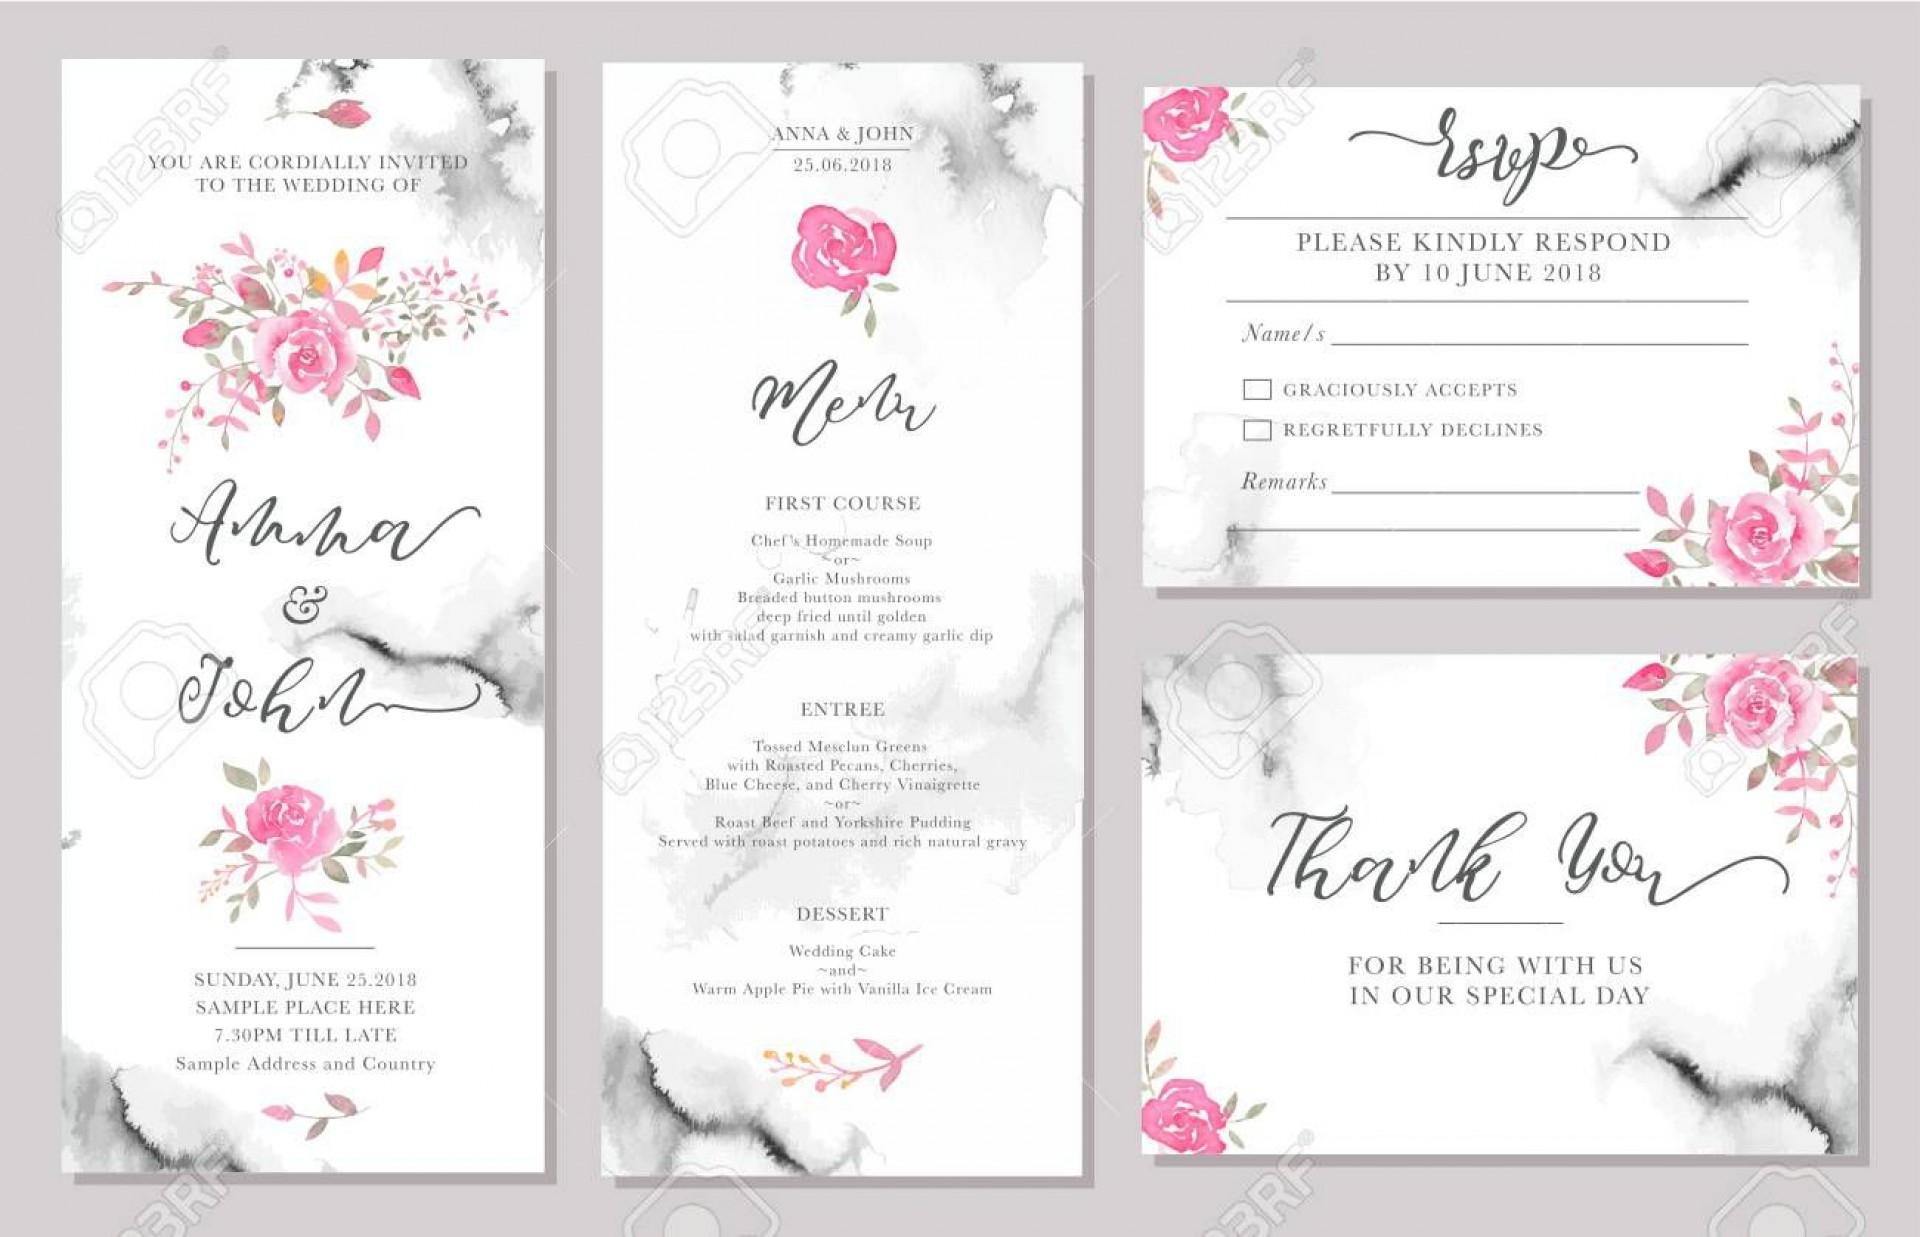 002 Phenomenal Sample Wedding Invitation Card Template Idea  Templates Free Design Response Wording1920